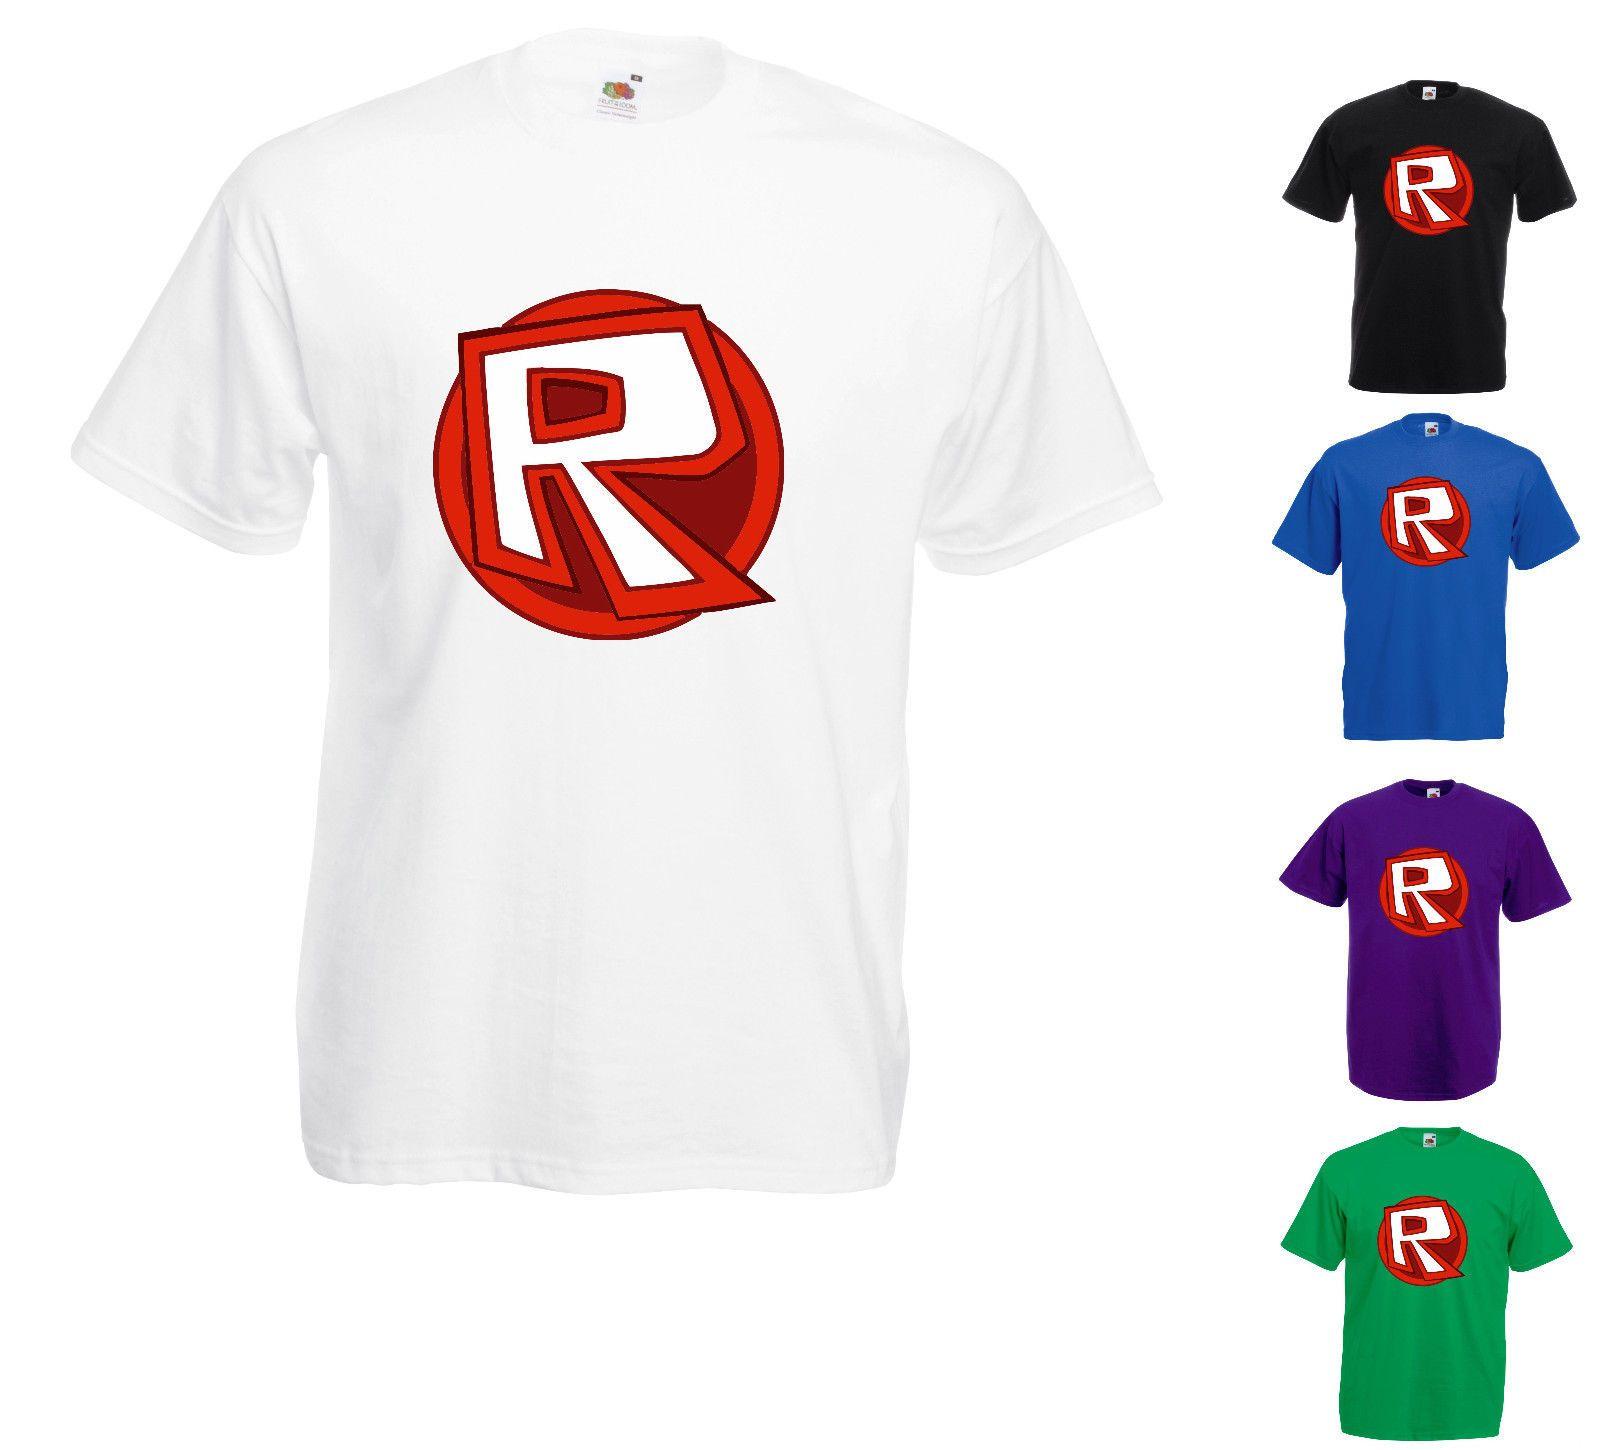 b8bede57 Roblox R Circle Logo Printed T Shirt Gaming T Shrt Fun T Shirt From  Zionsgate, $10.82| DHgate.Com